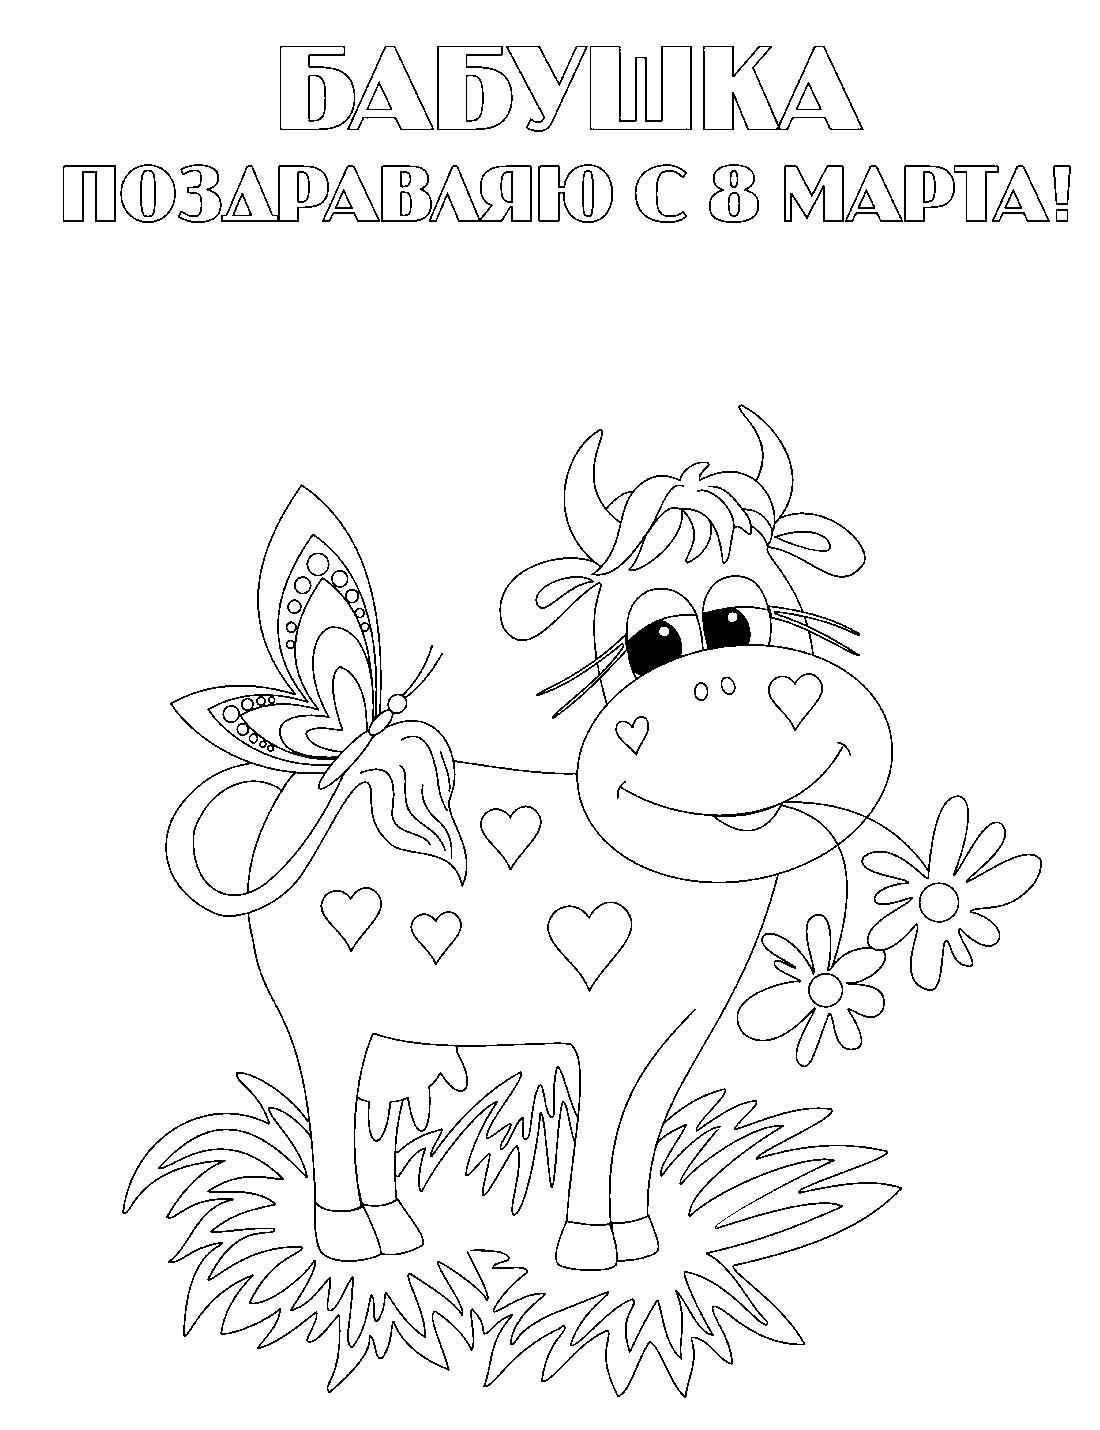 Корова поздравляет бабушку - раскраска №13303 | Printonic.ru